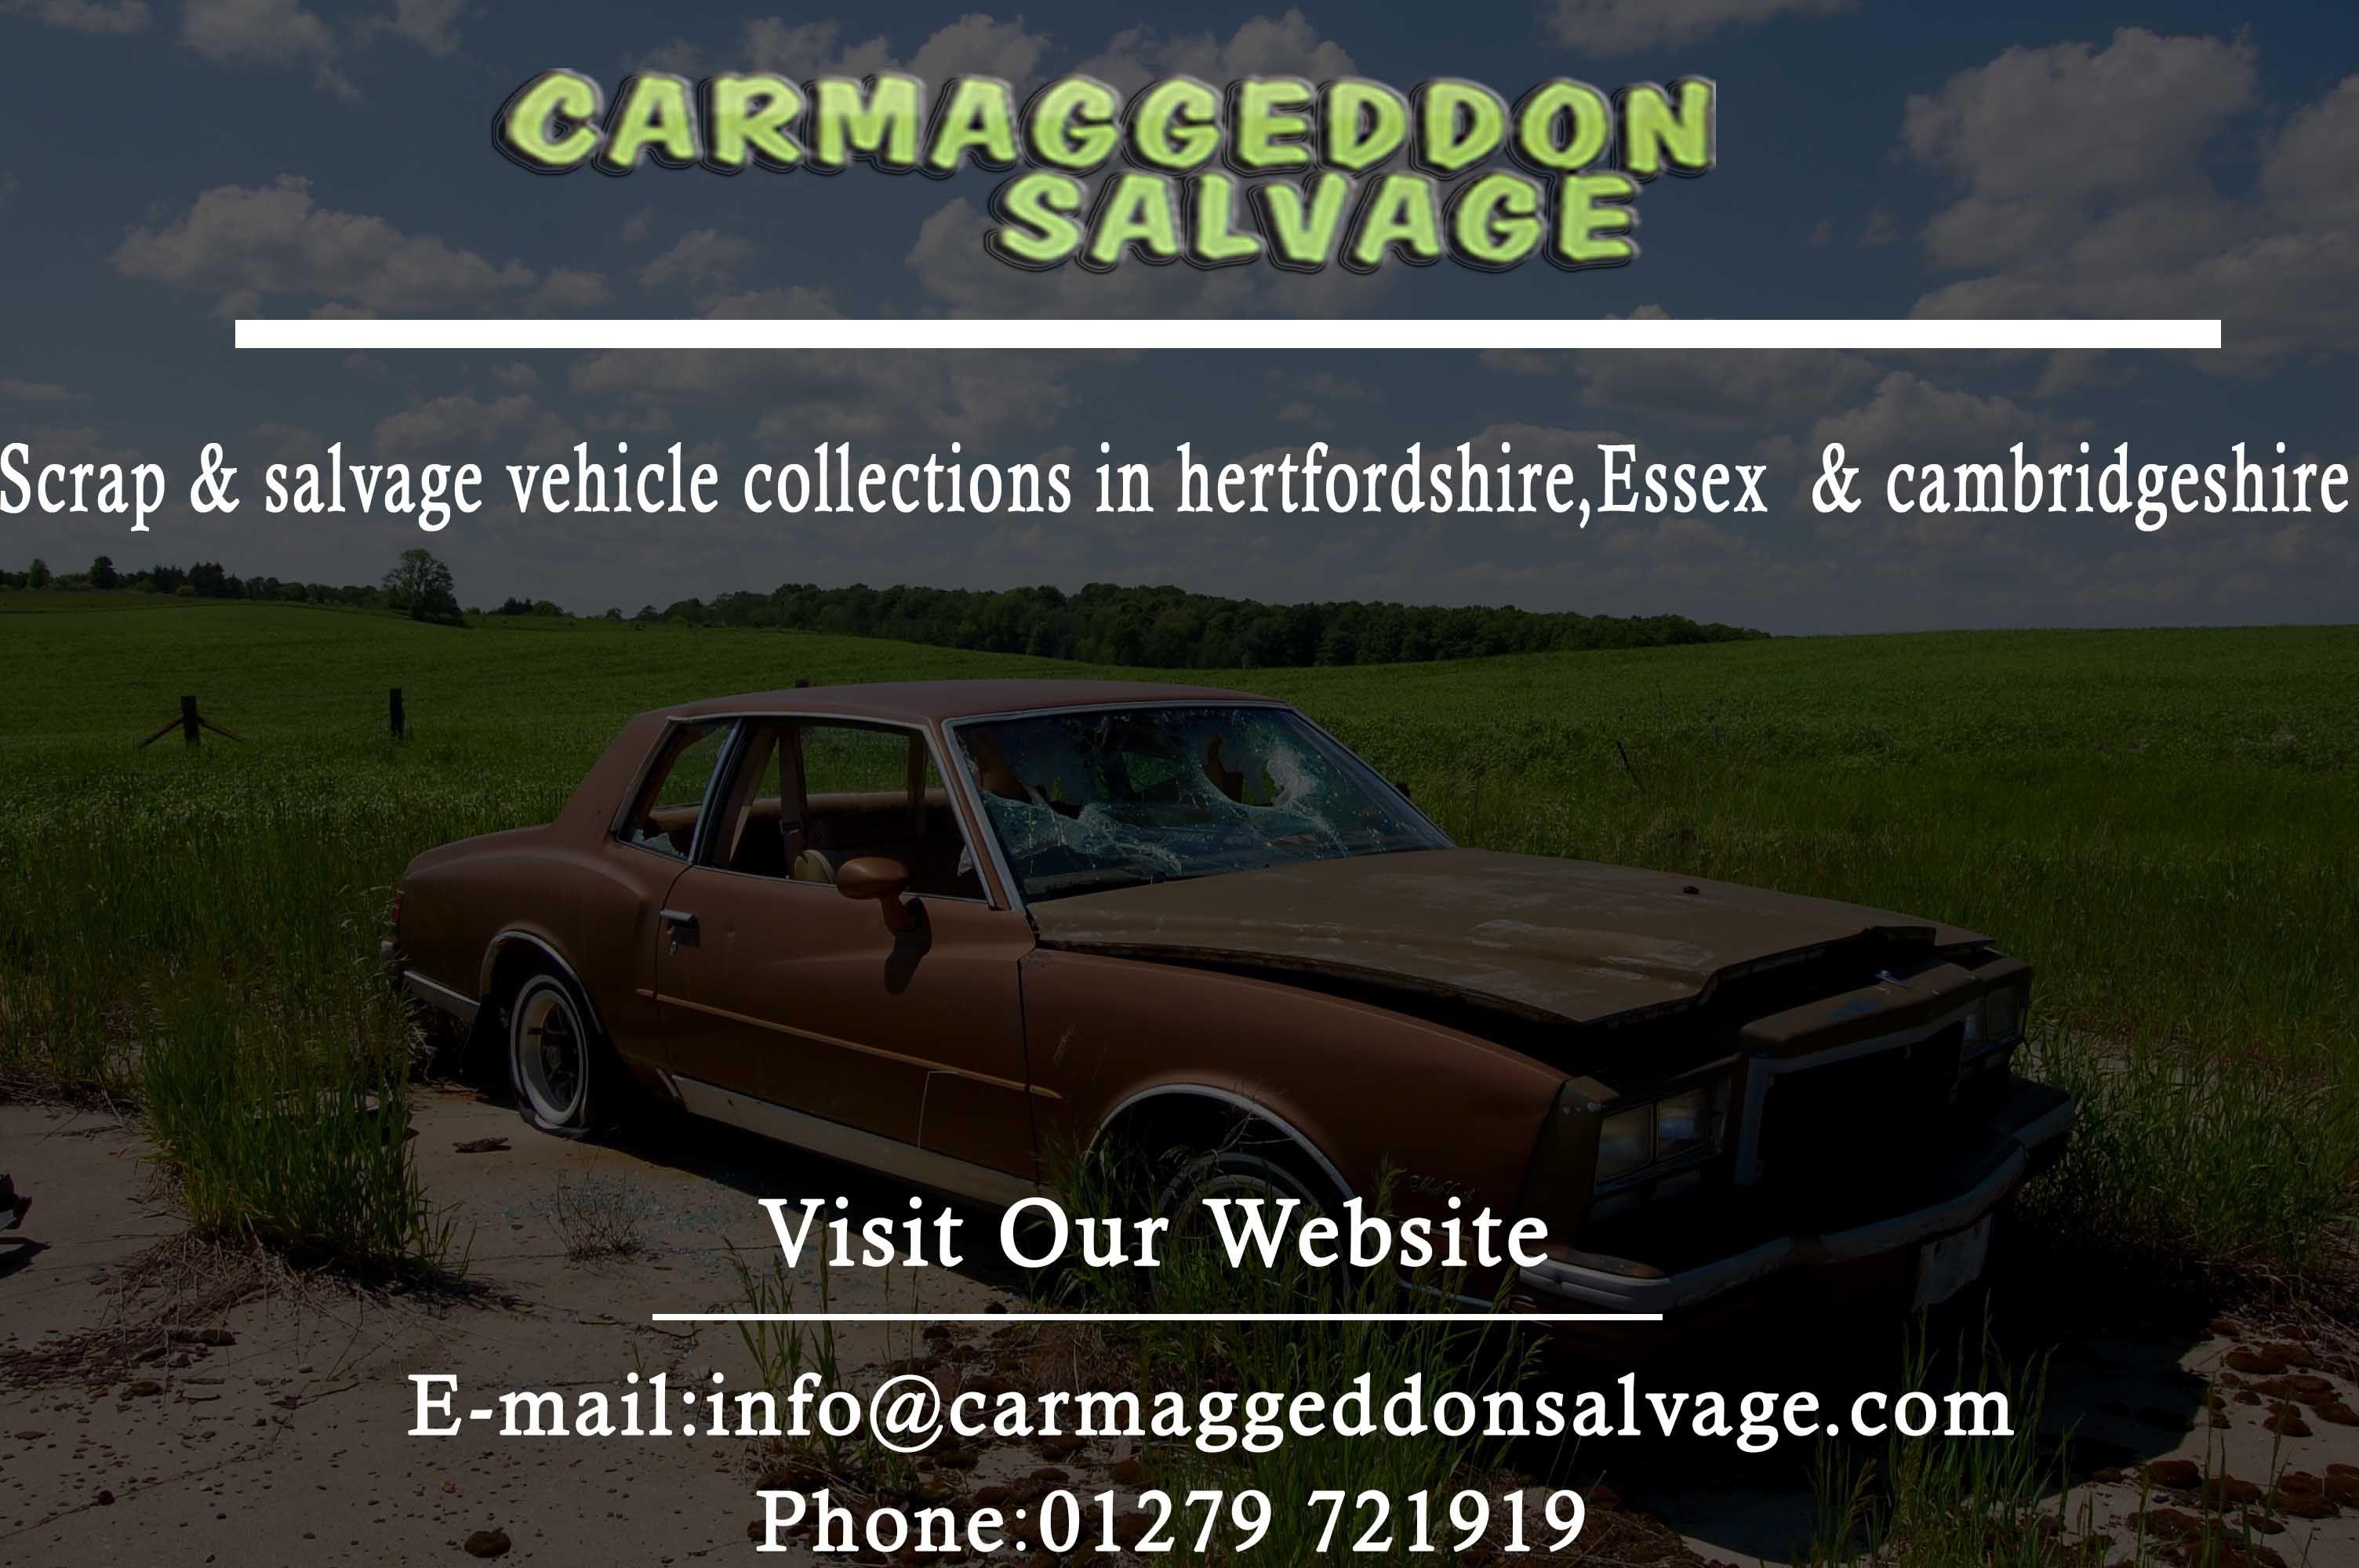 Scrap my car online at Carmaggeddon Salvage #ScrapMyCarOnline ...